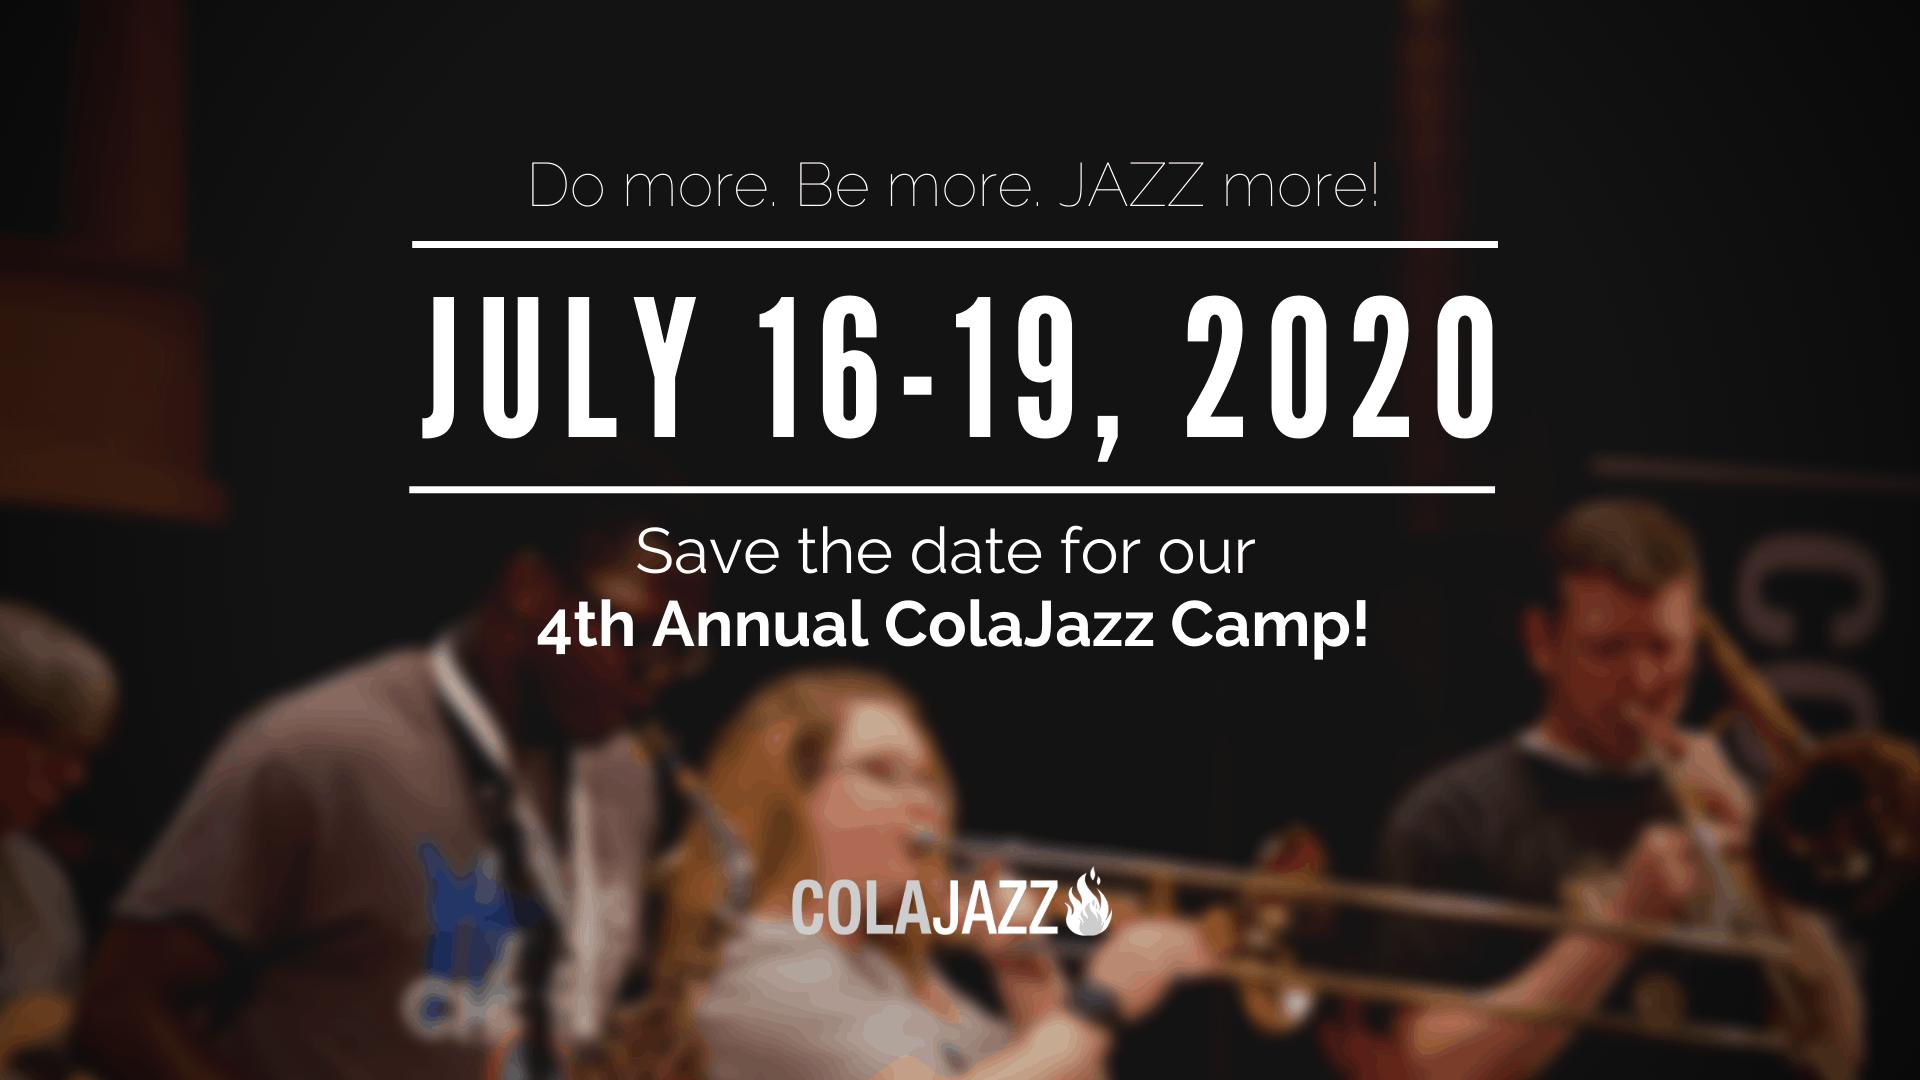 ColaJazz Summer Camp 2020